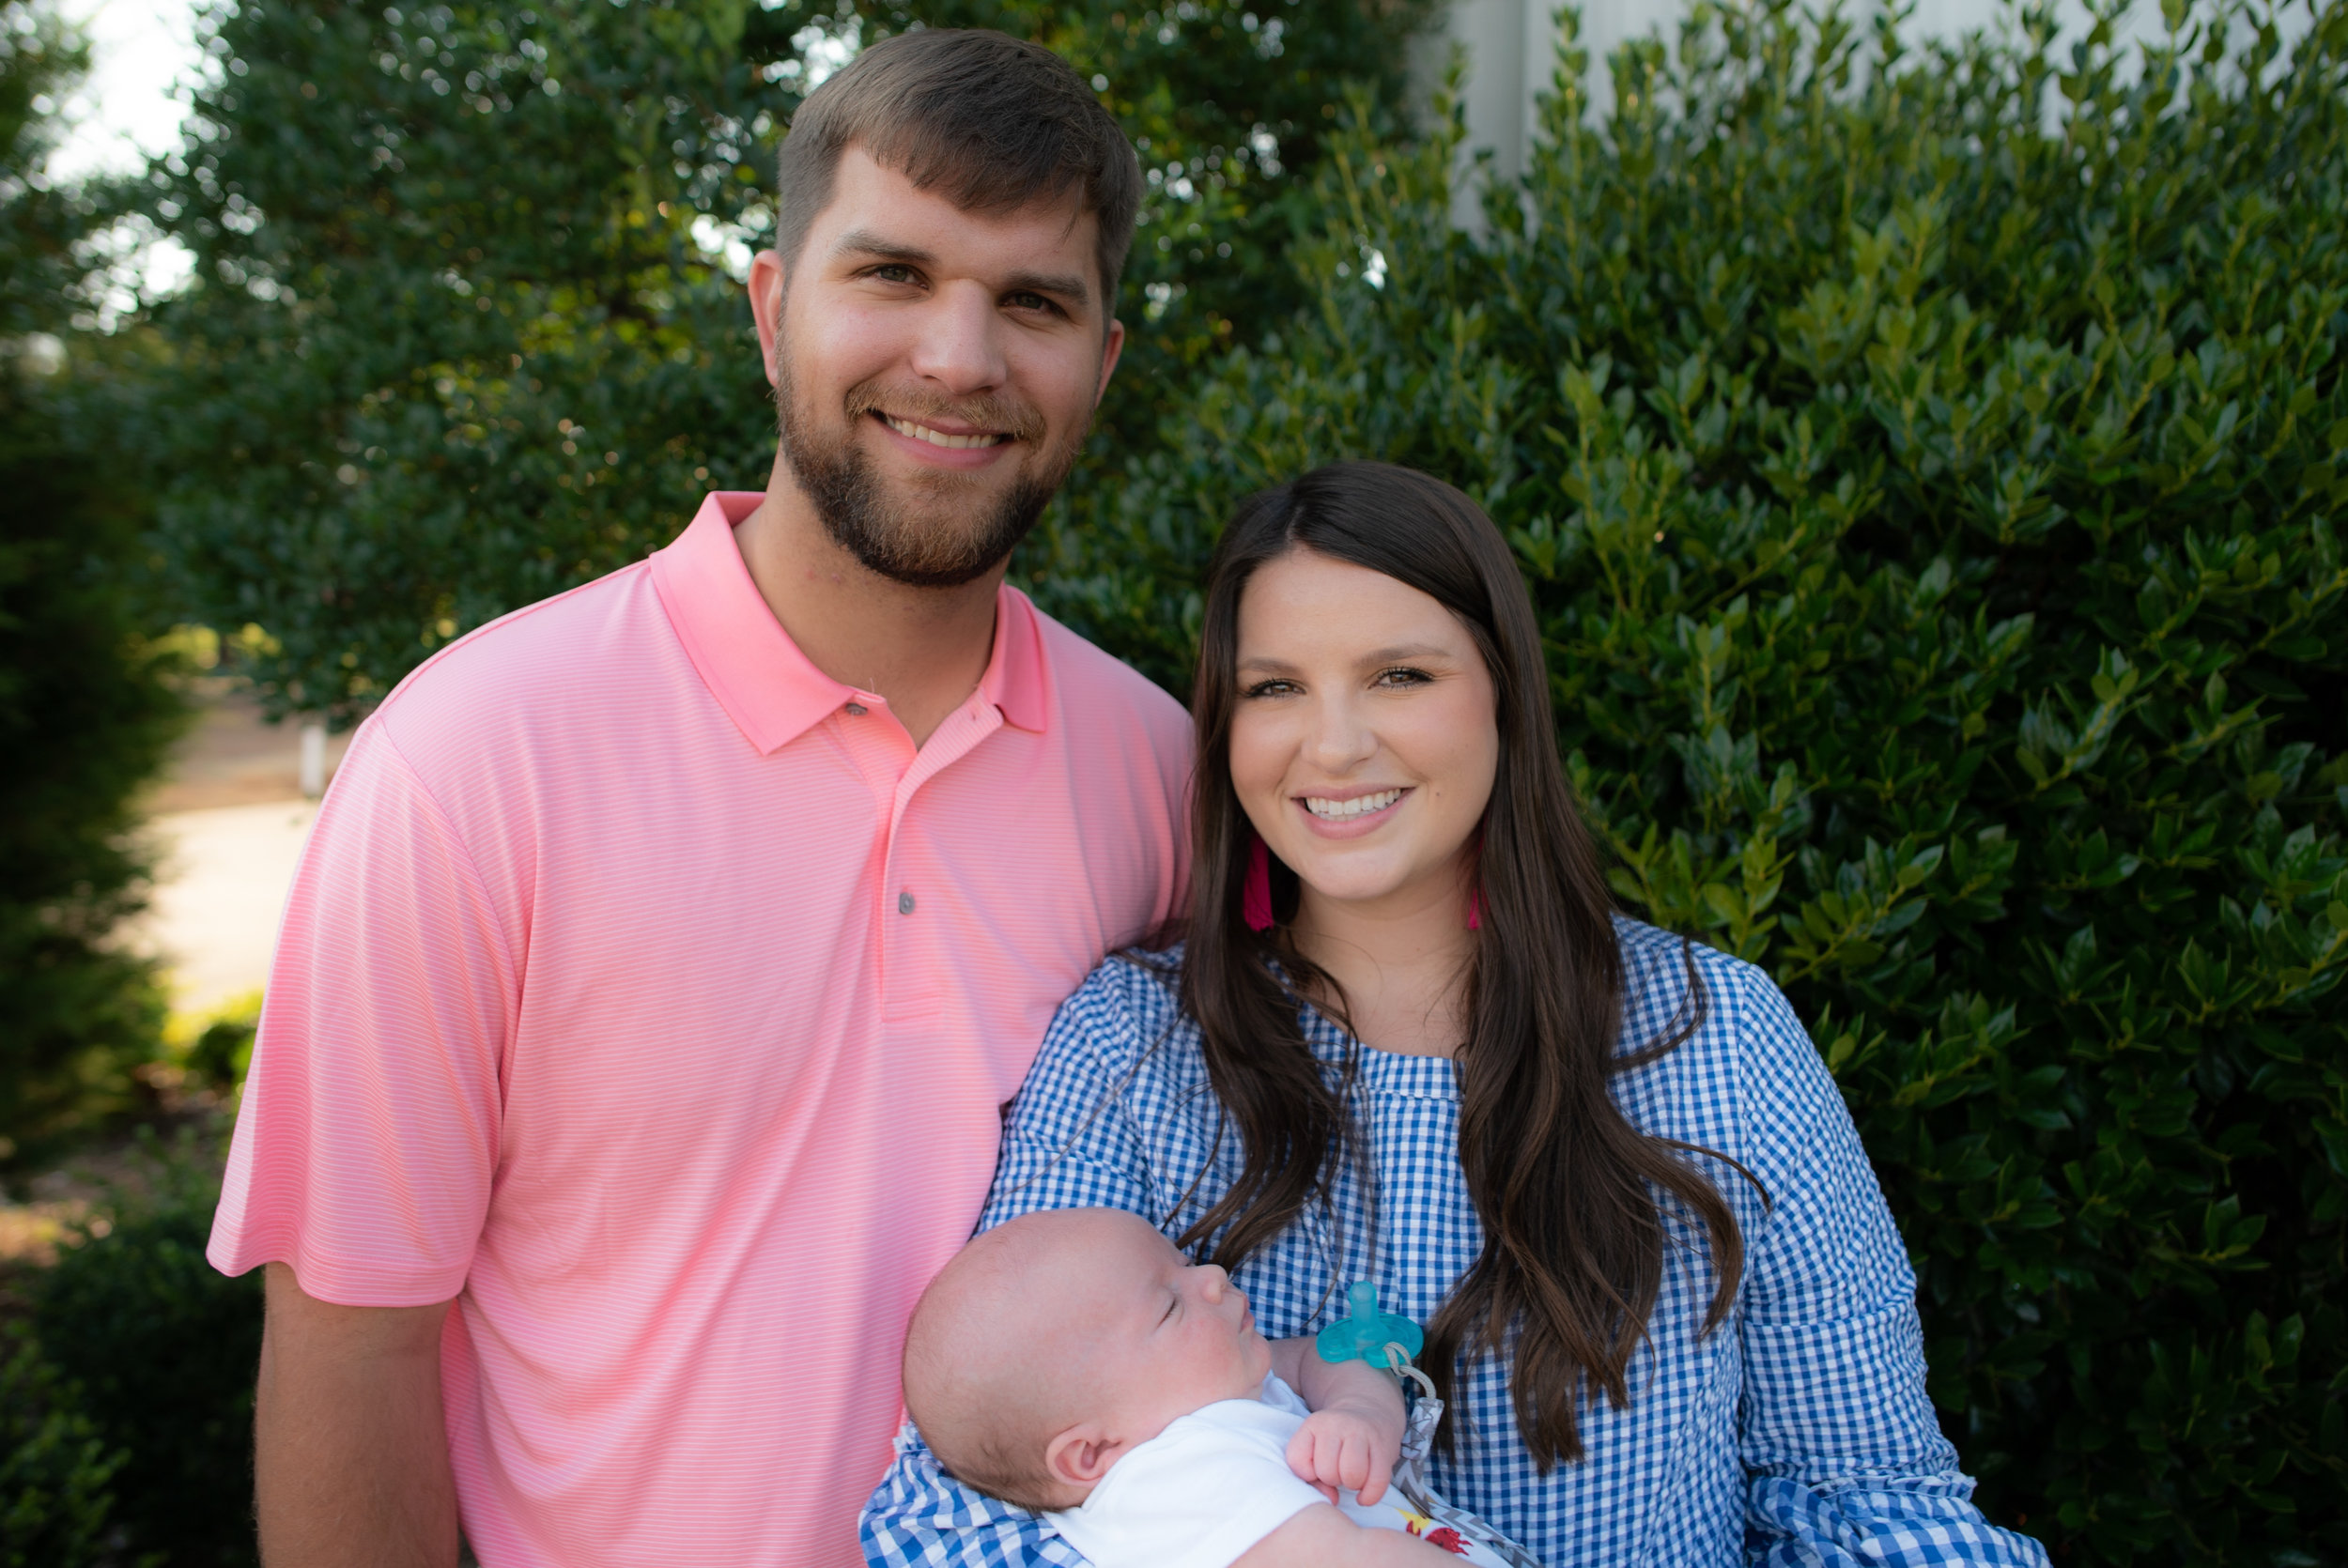 riverview mc - Leaders: Holden & Jordan CorumHosts: Keith & Paige PhillipsWhen: Wednesdays. 6:00-8:00Contact: 256-503-9532holdenco4@att.net